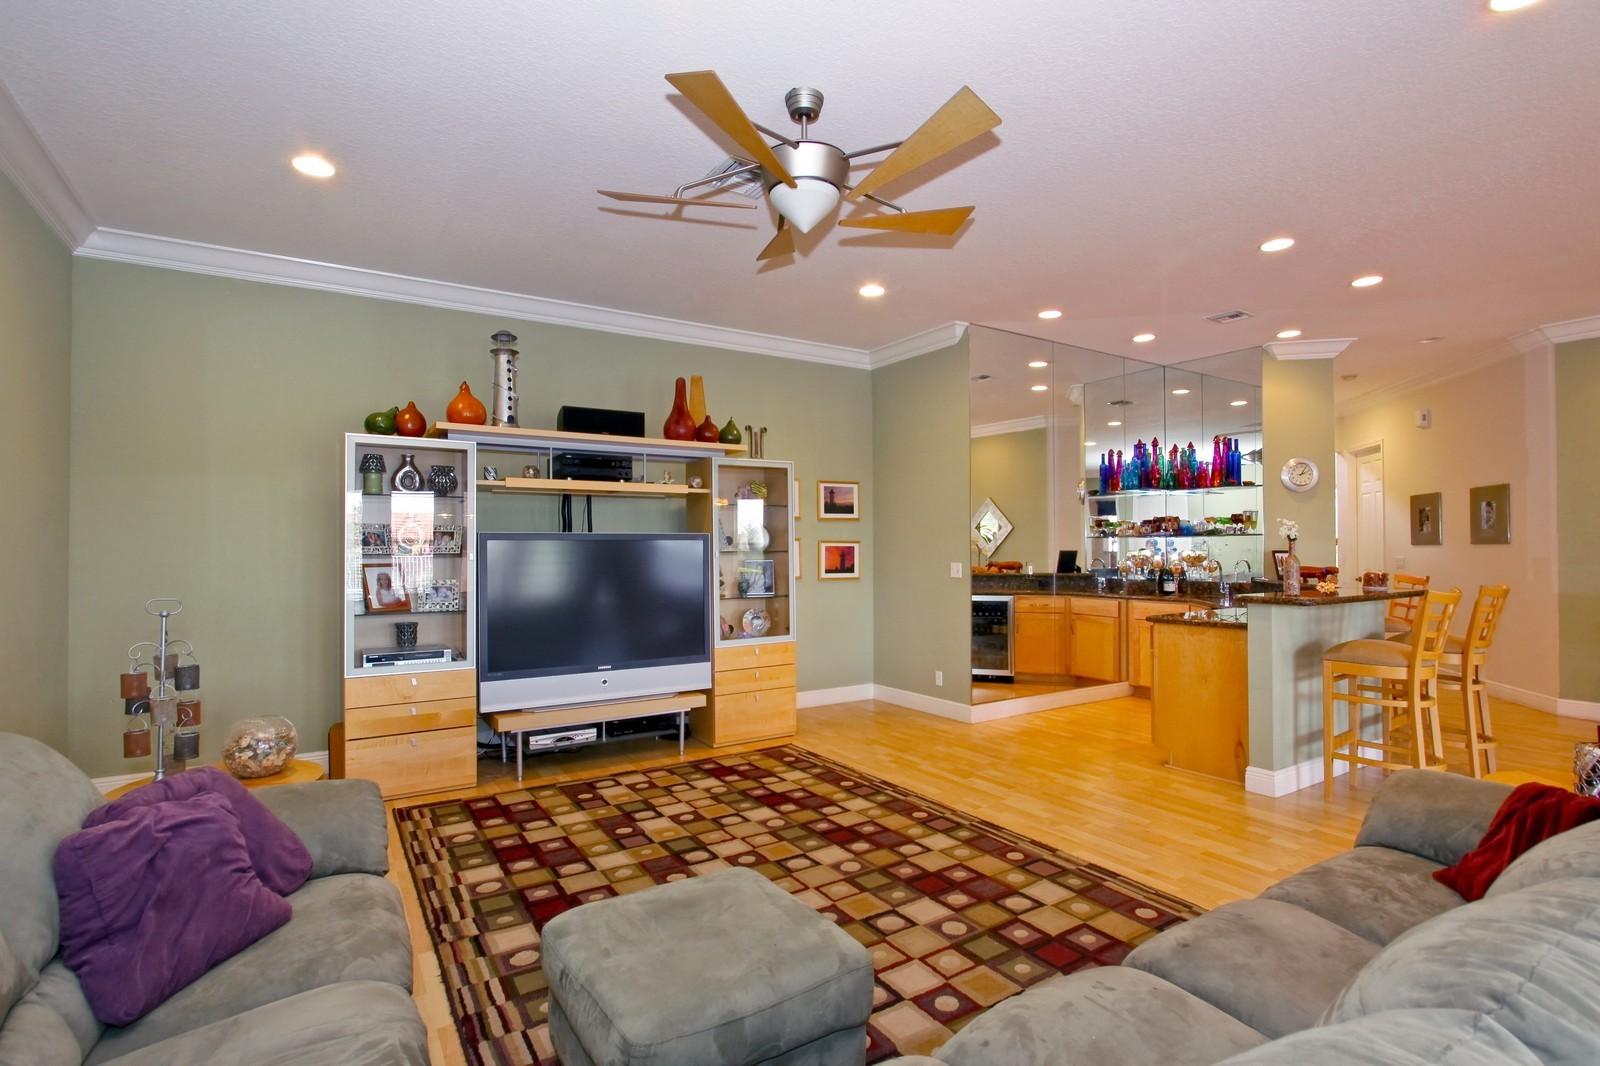 Real Estate Photography - 14542 Draft Horse Ln, Wellington, FL, 33414 - Location 1